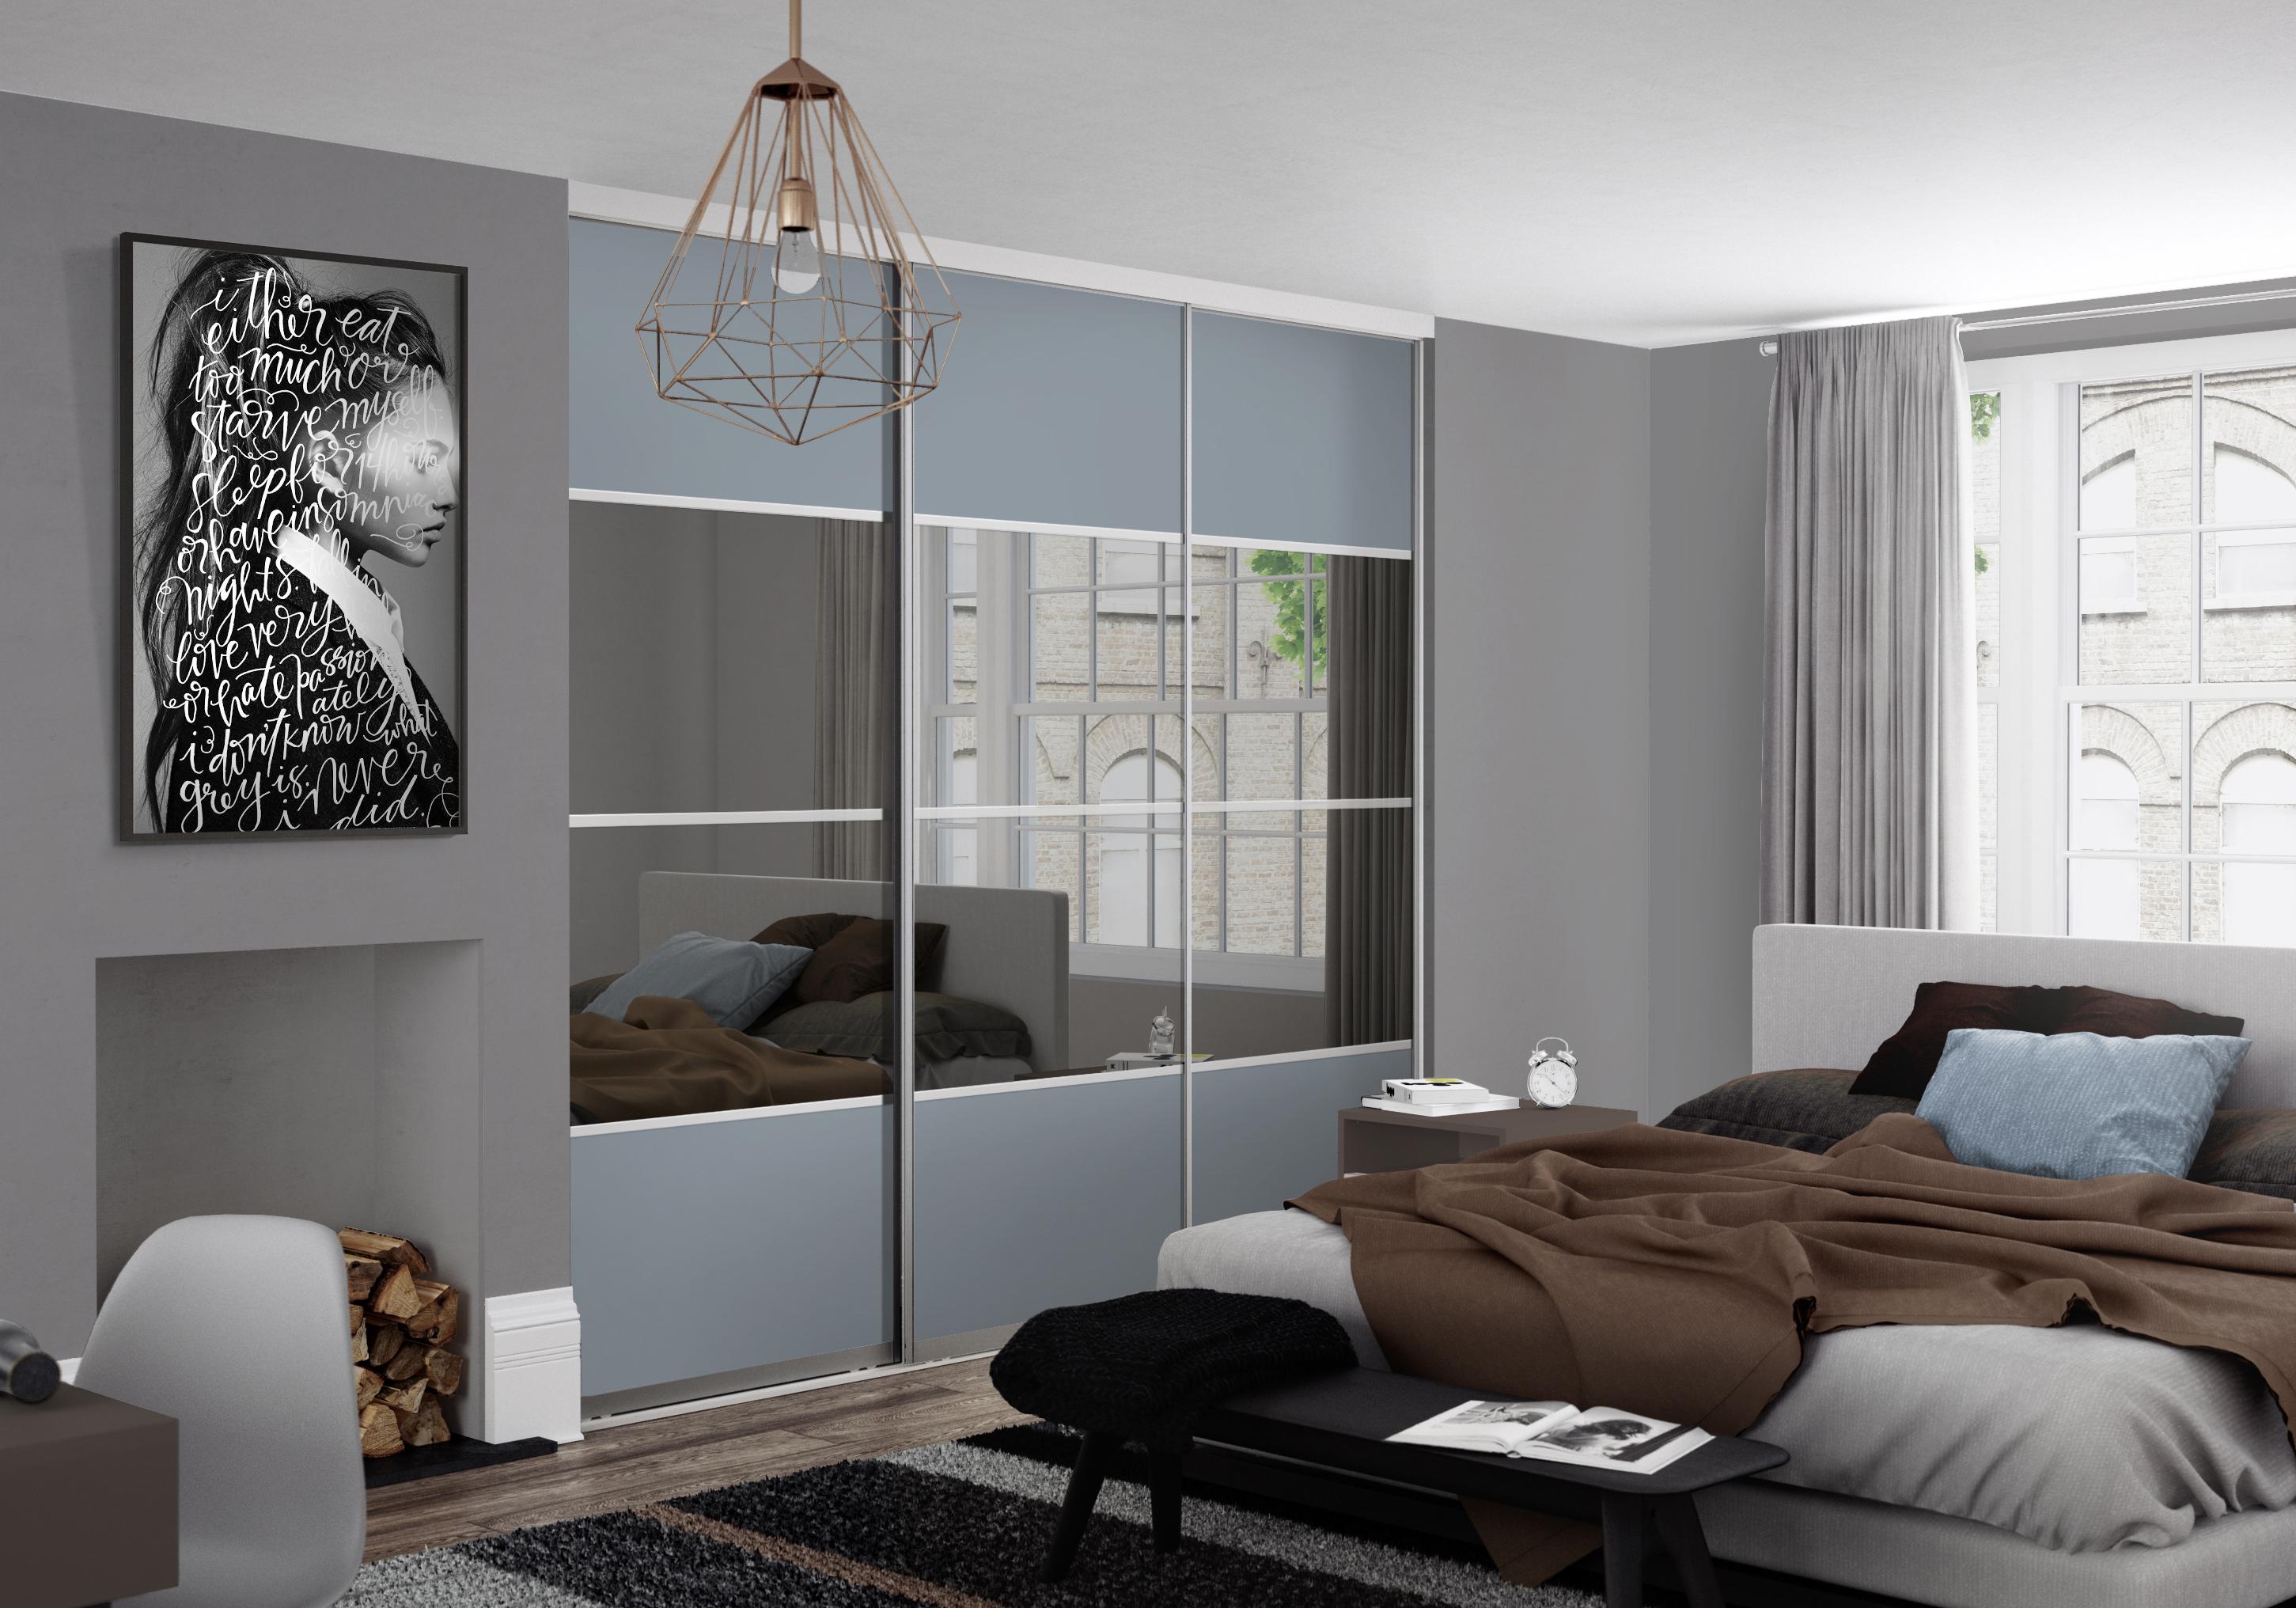 Interior design trends 2017 2018 wardrobe trends spaceslide for Fitted bedroom furniture 0 finance